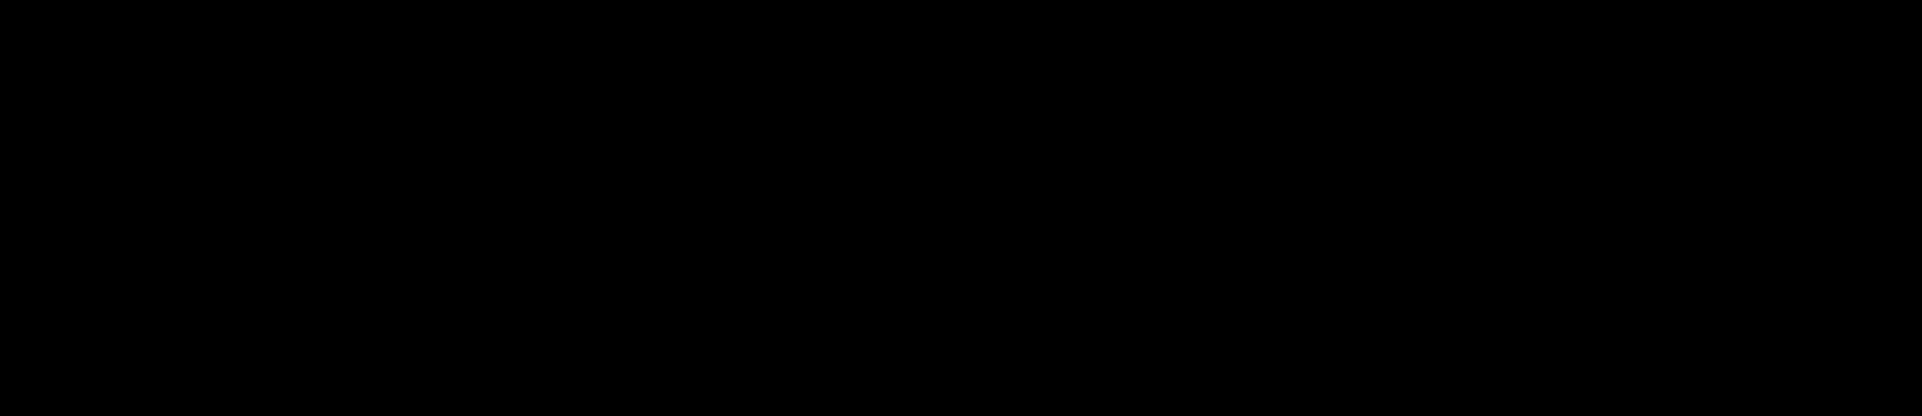 Anime Charlotte ZHIEND Logo by darkblackswords